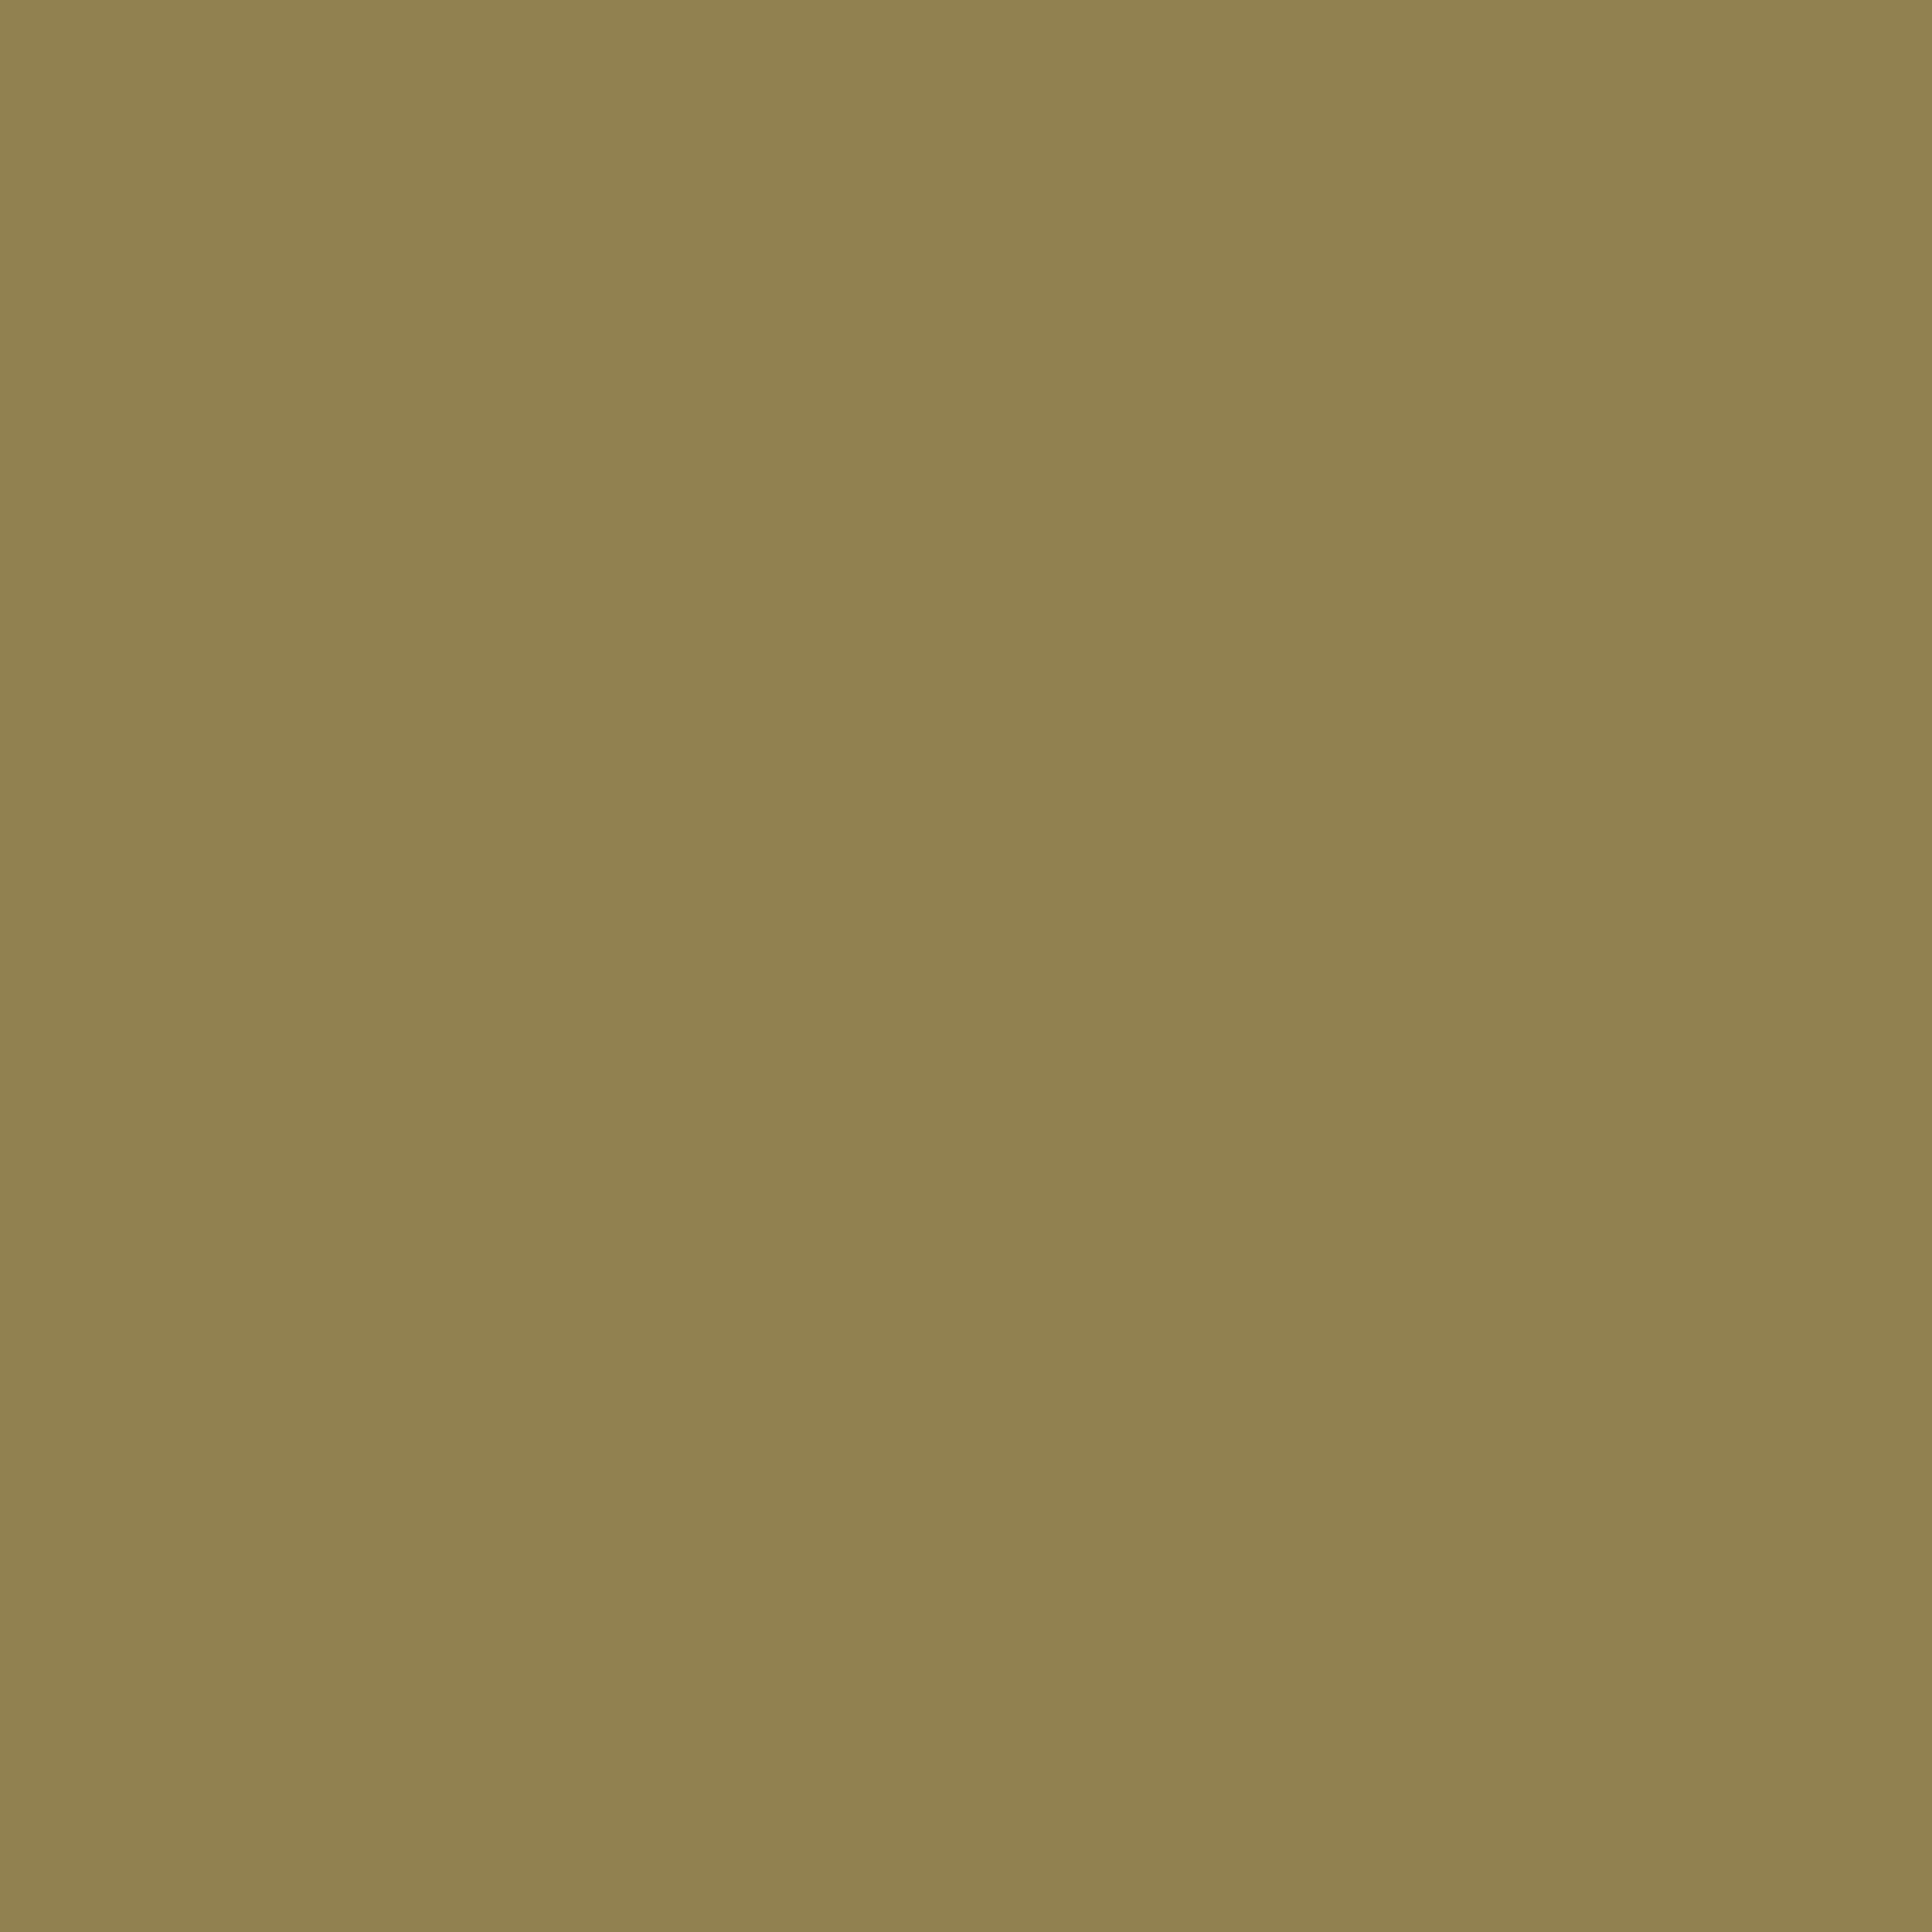 2732x2732 Dark Tan Solid Color Background